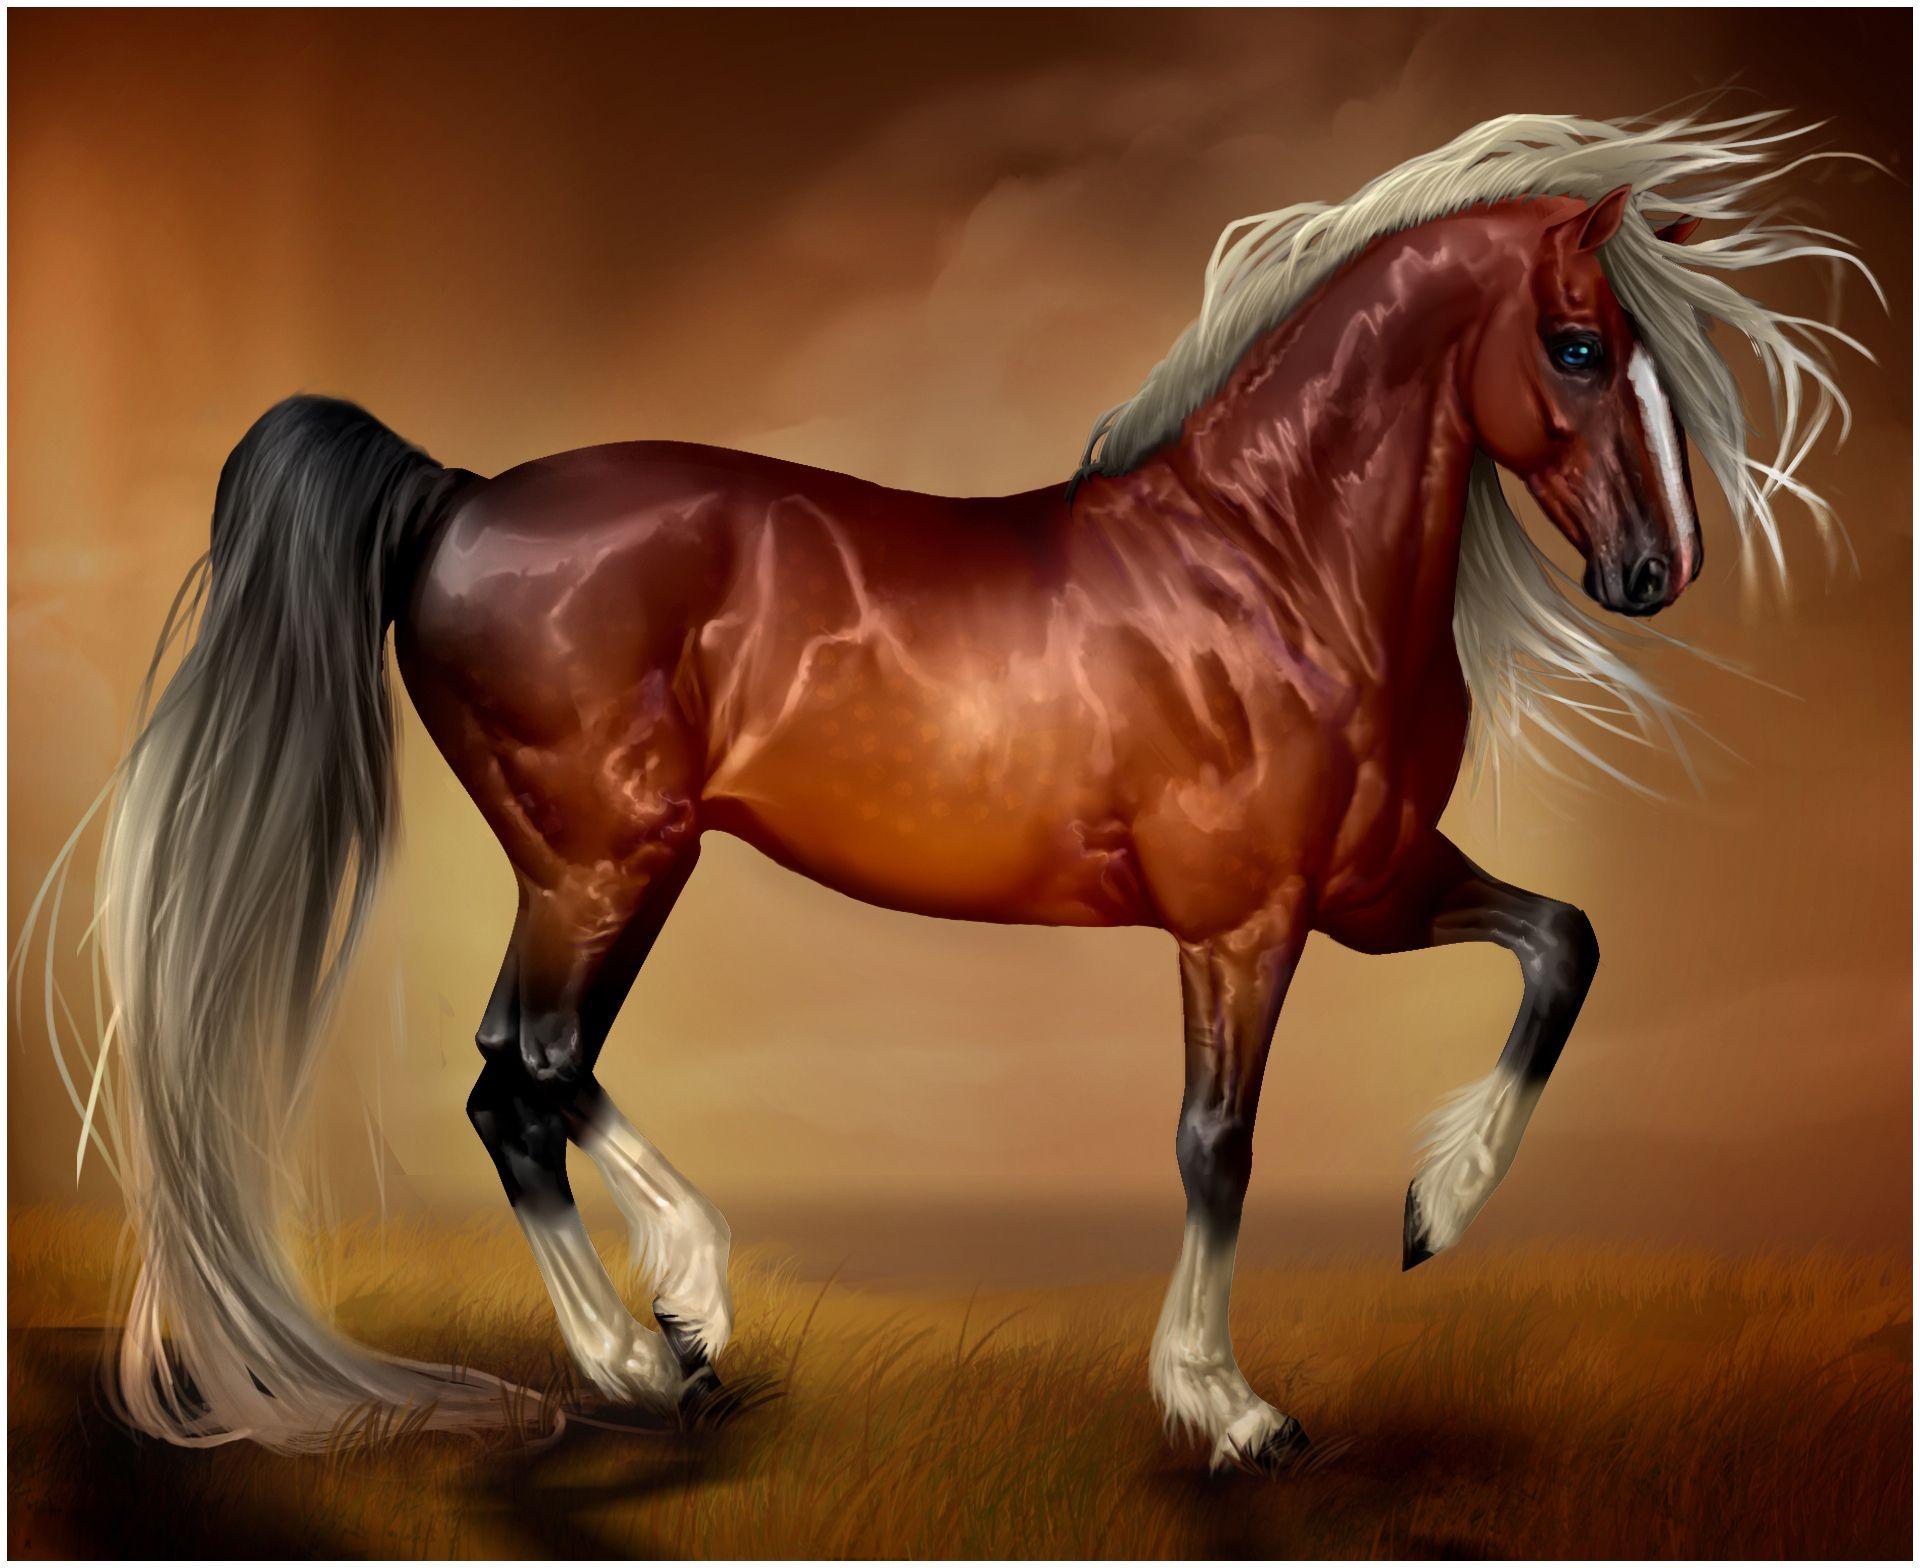 Popular Wallpaper Horse Pinterest - 41011171f42574ffadaba2b17e8a5fed  You Should Have_363712.jpg